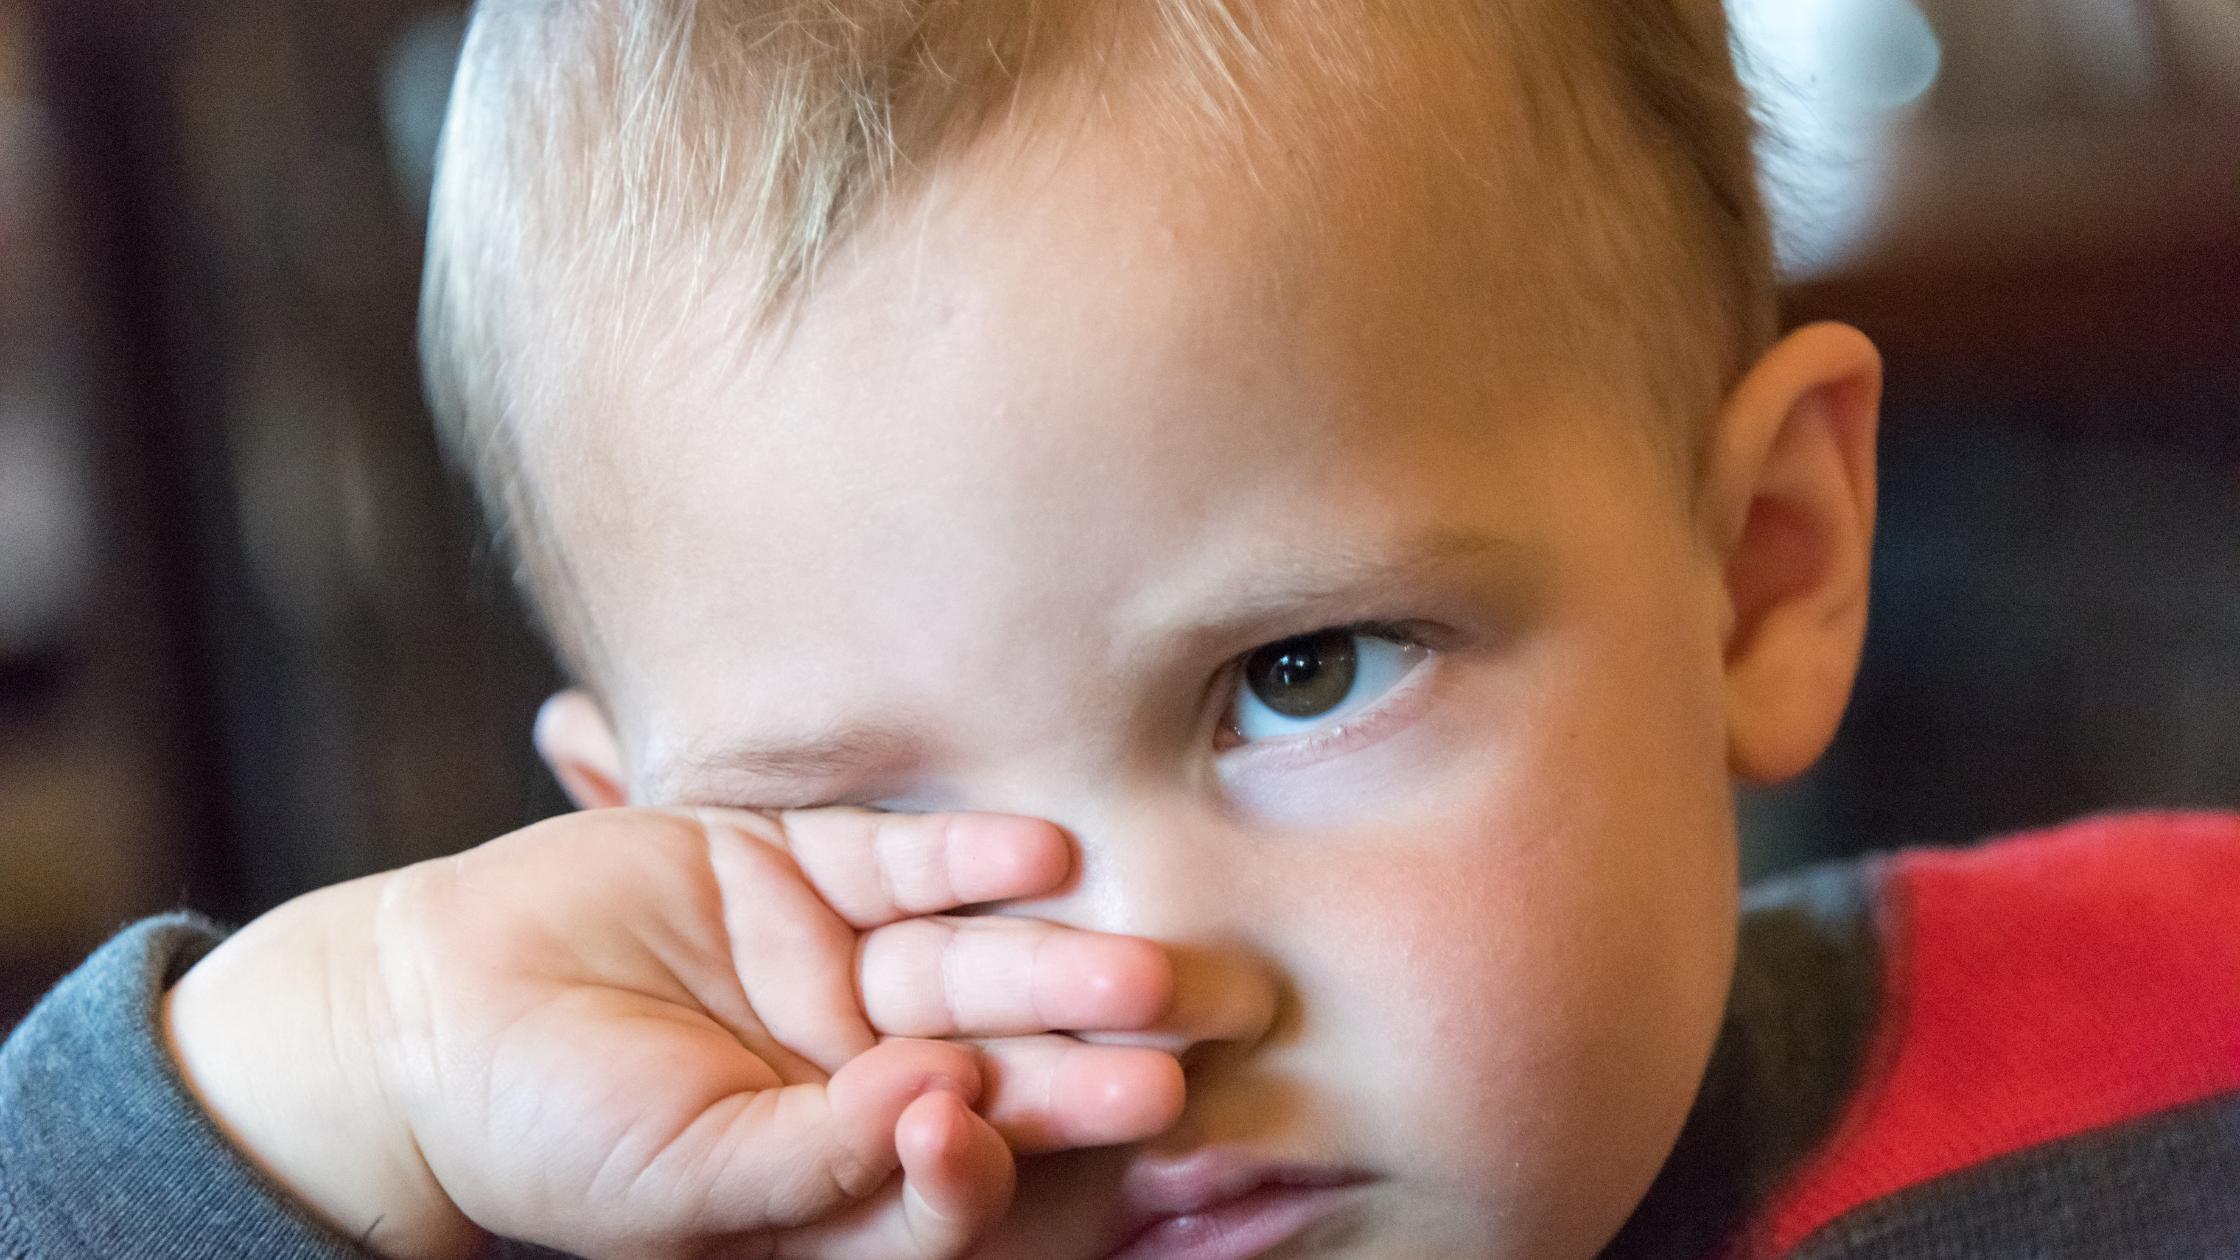 little boy rubbing his eyes